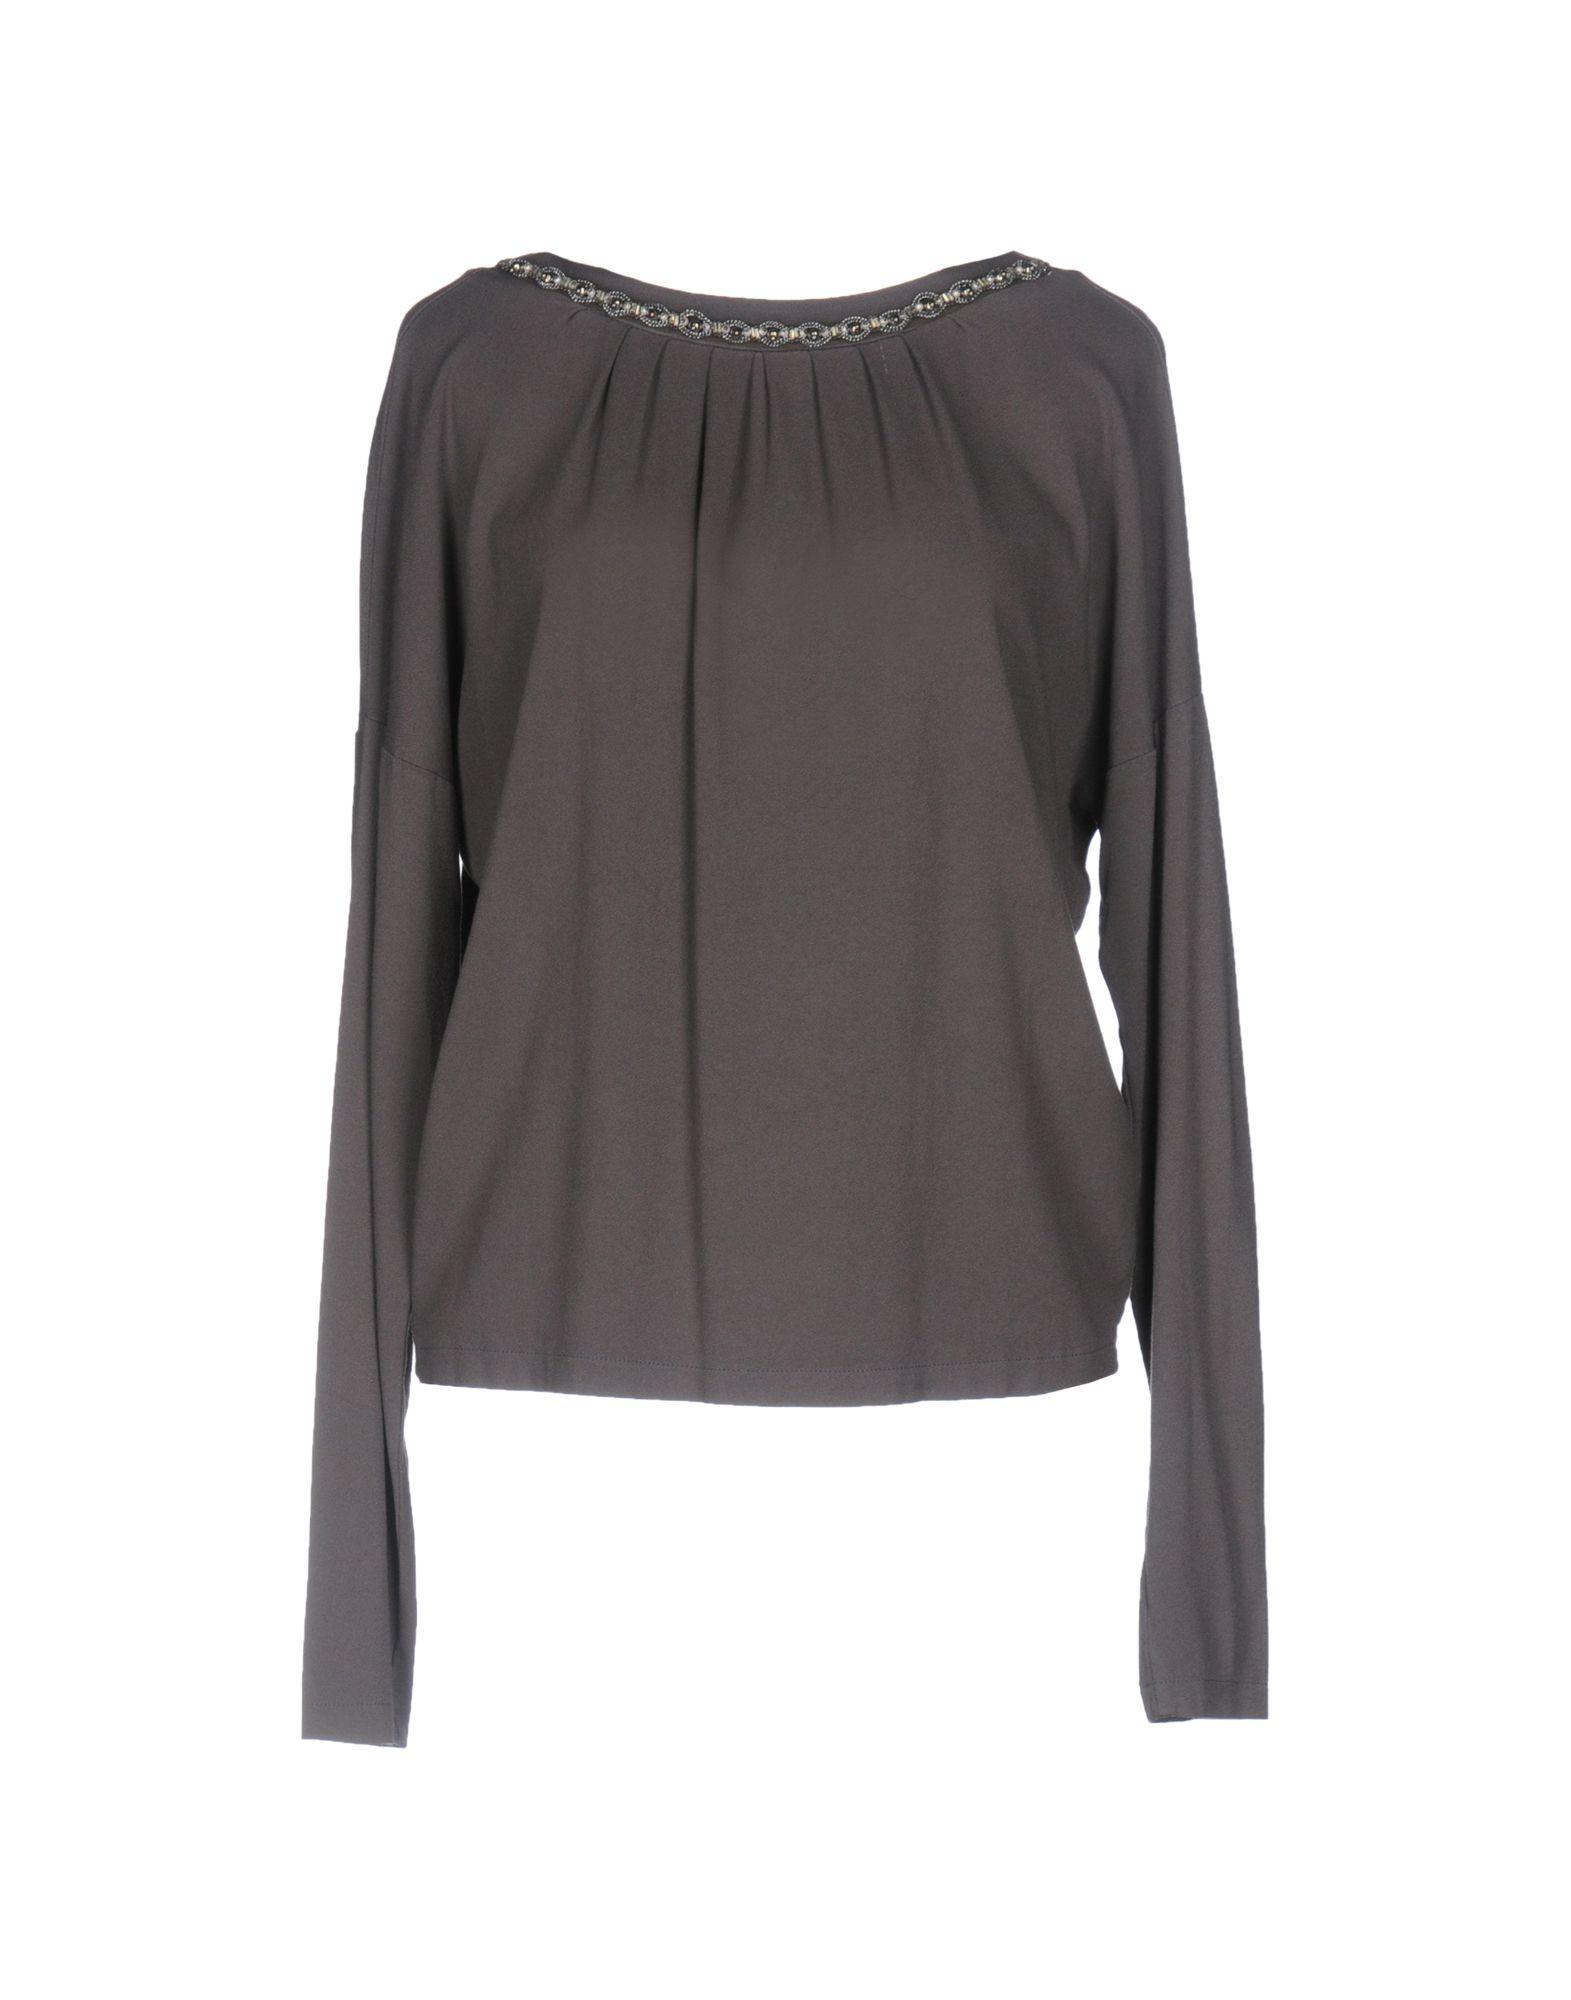 Фото - EMMA & GAIA Блузка блузка emma monti